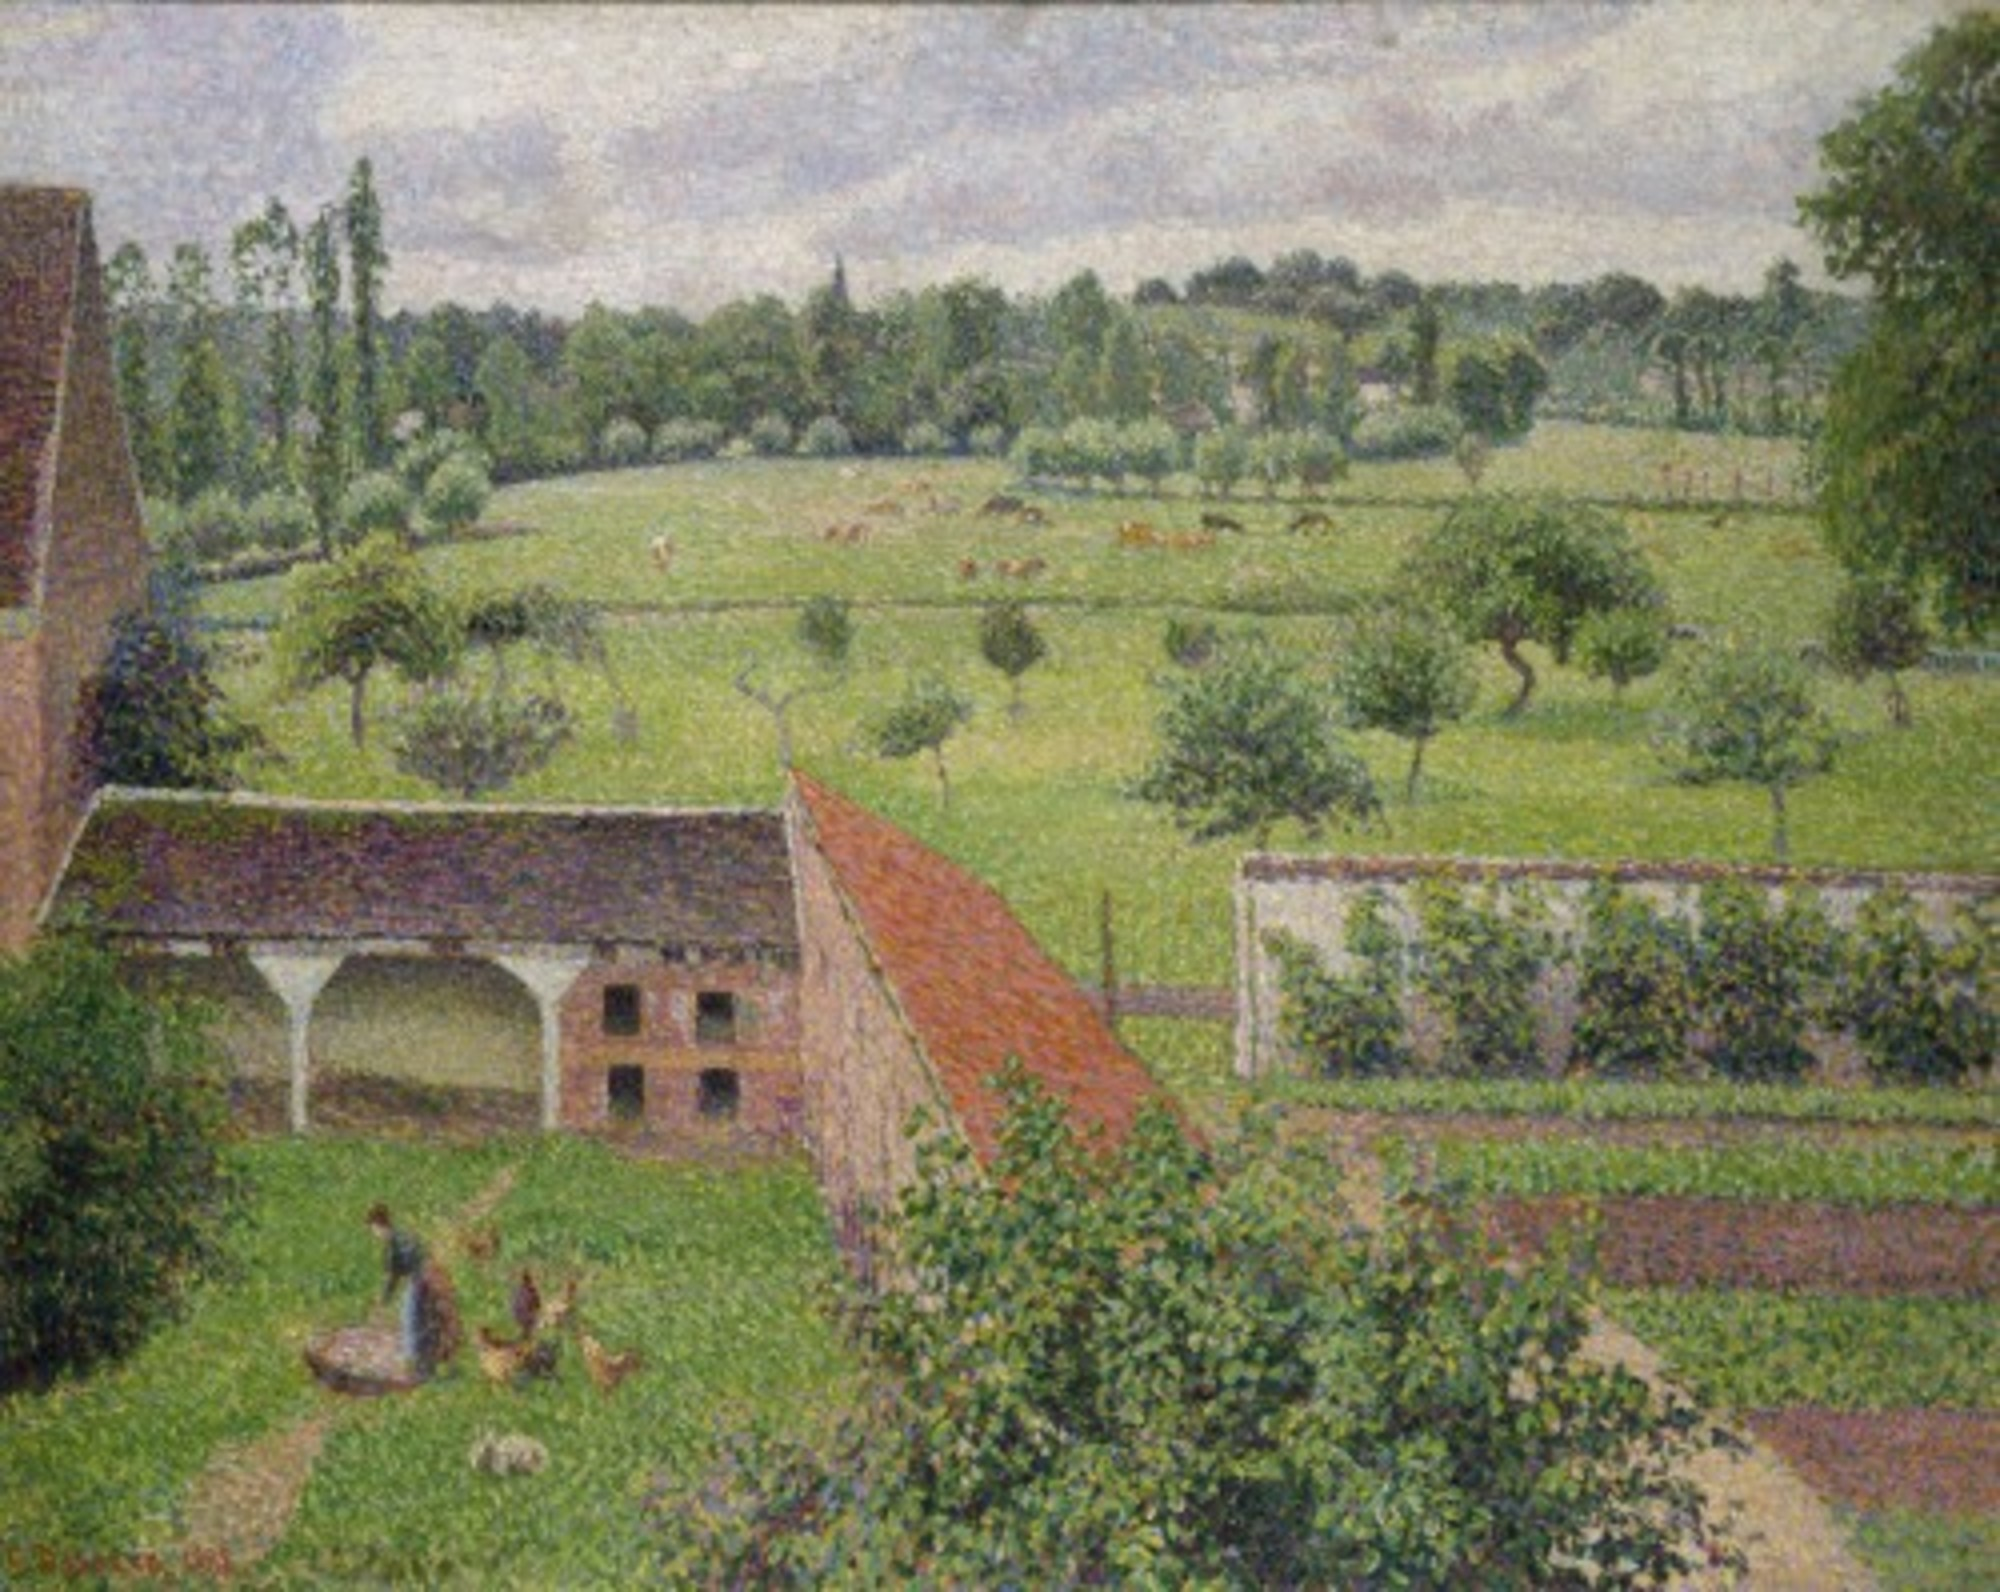 Camille-Pissarro---View-from-my-Window-Eragny-sur-Epte-1888.jpg